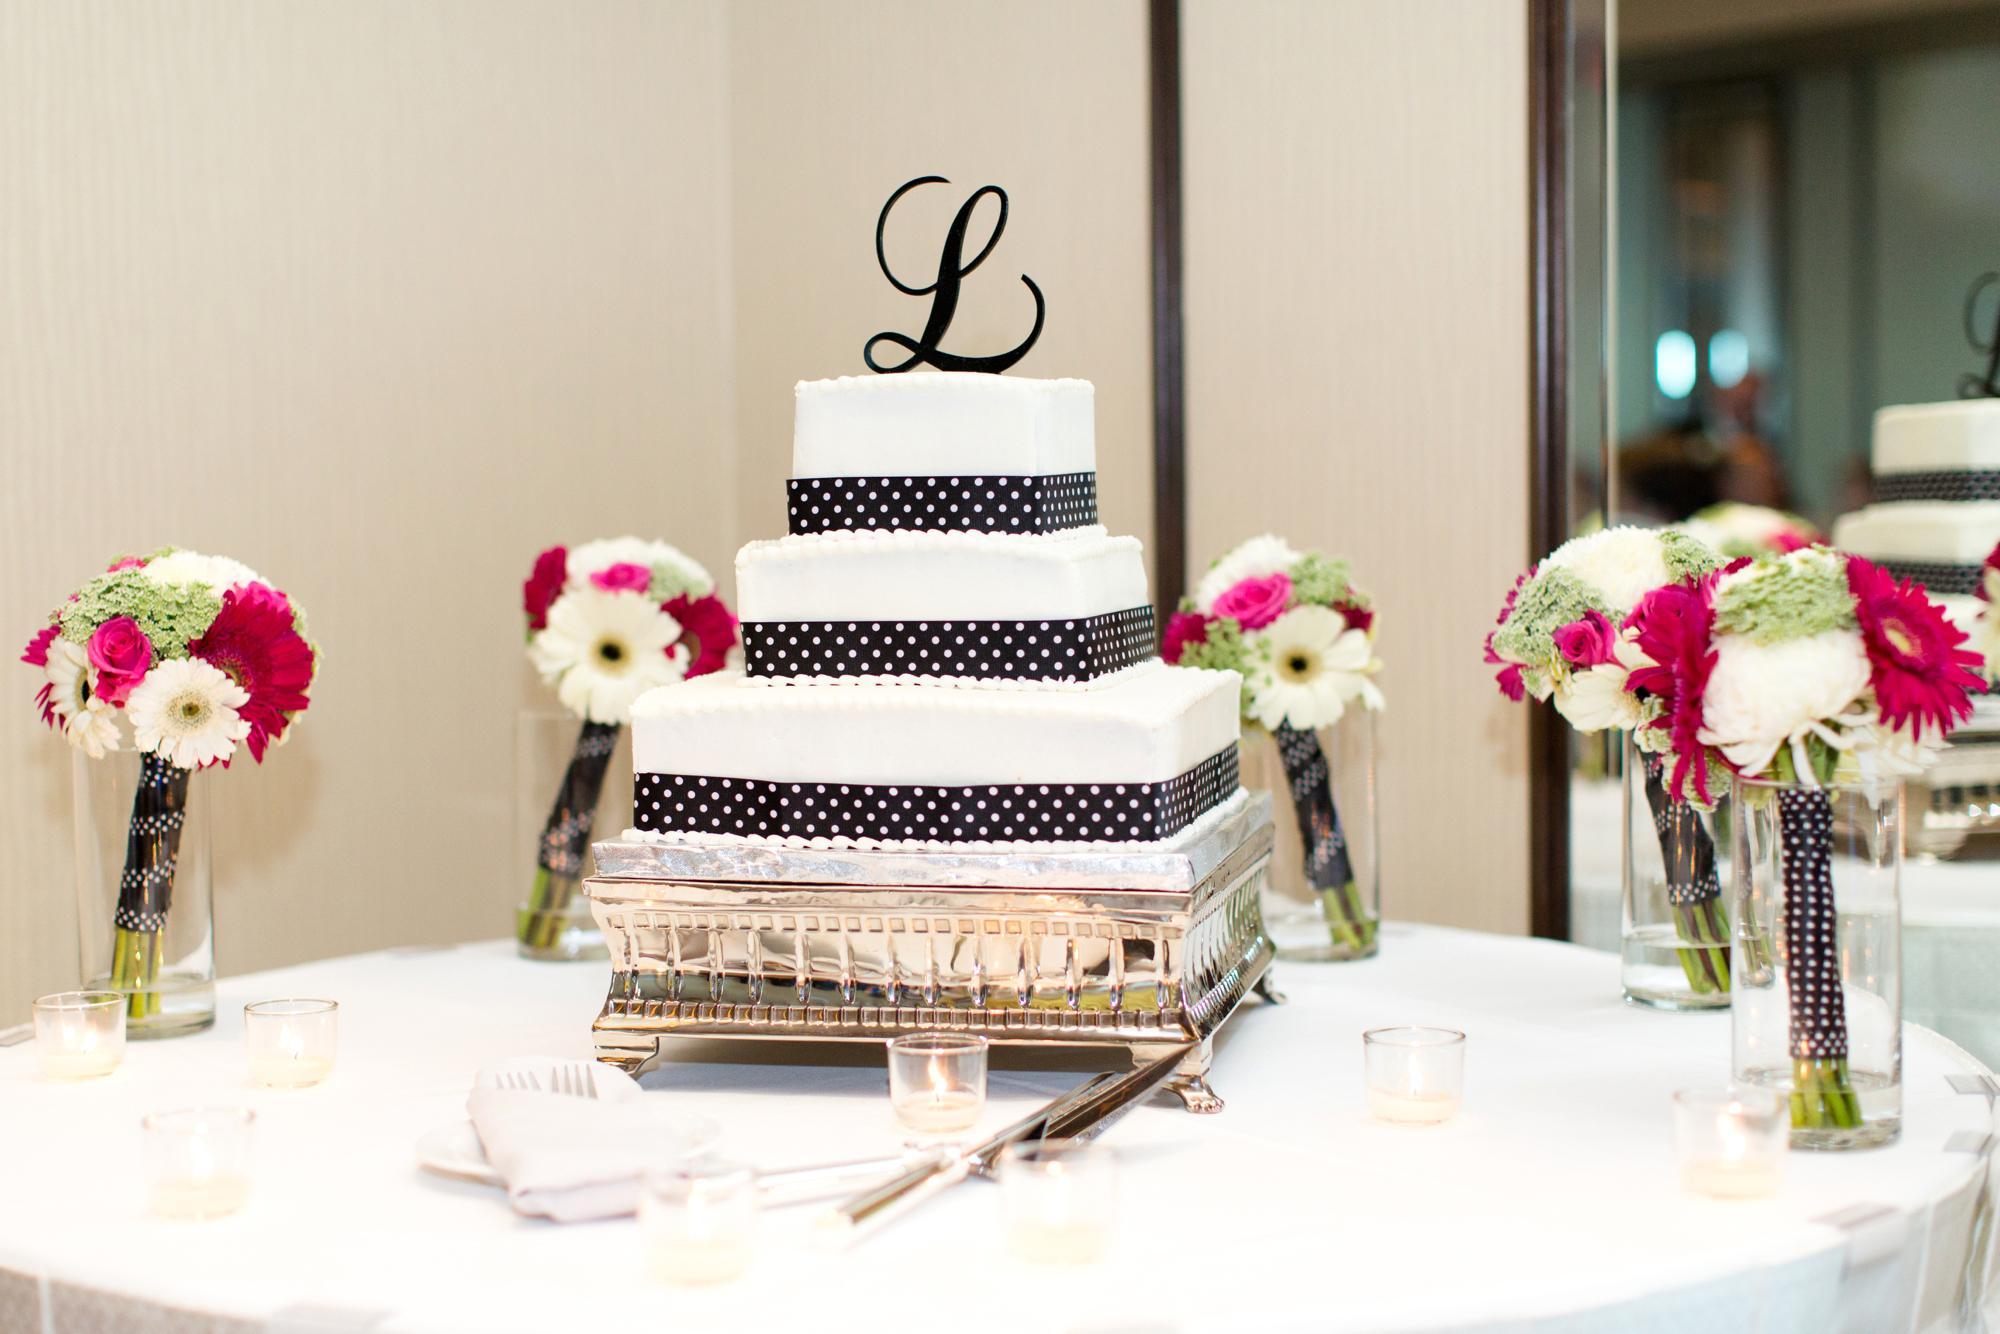 6-Lambert-Wedding-Reception-199 (deleted c99a5a4f71abdc931e9ad9f3ce447b3d).jpg